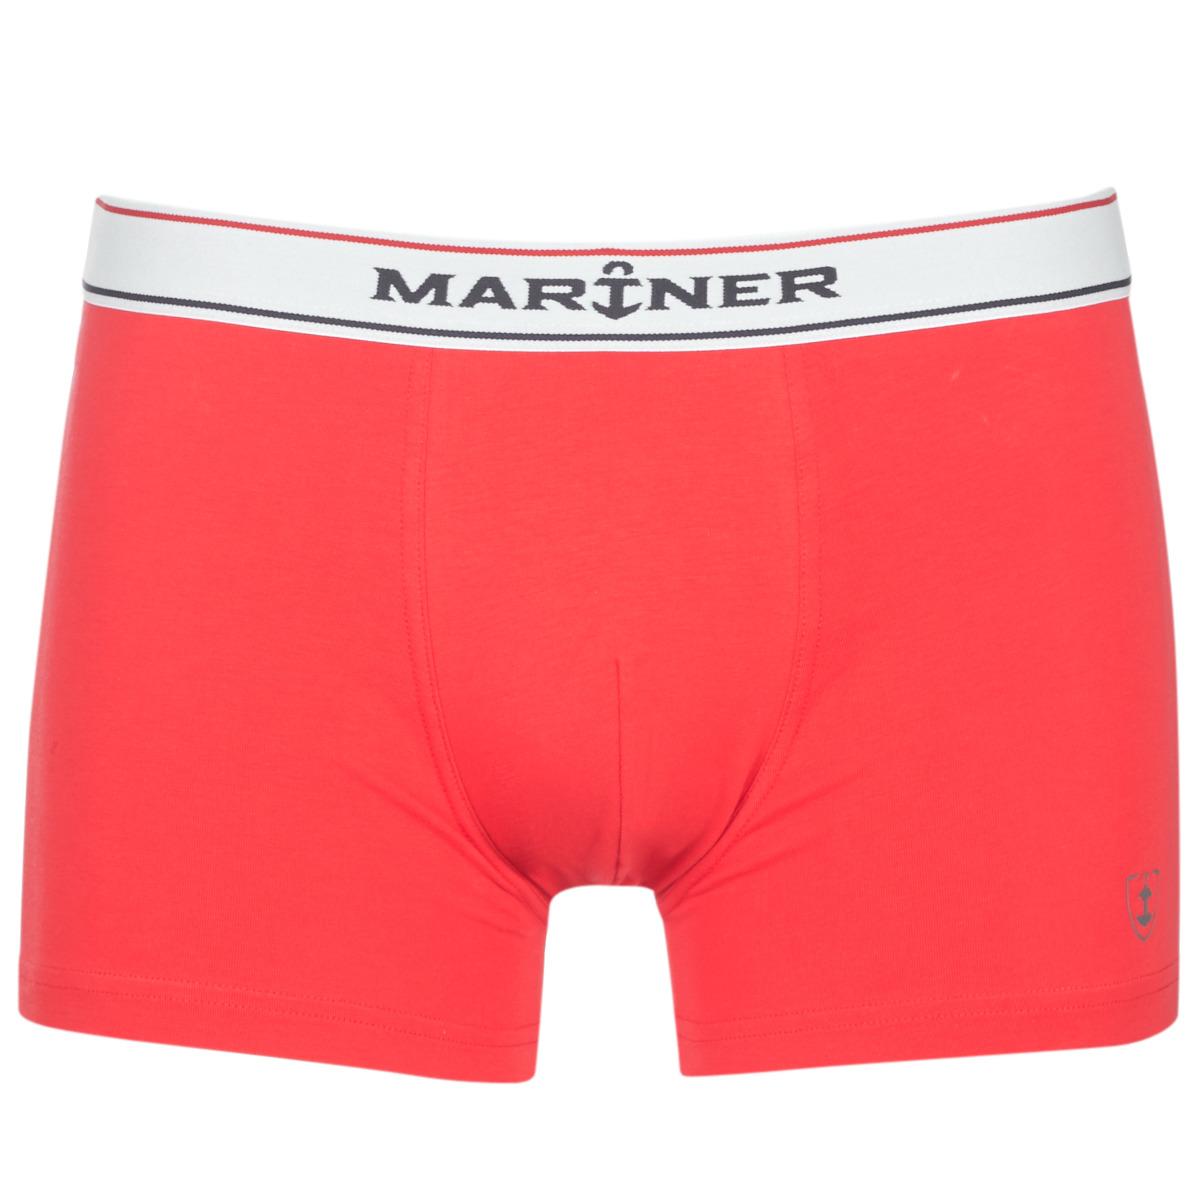 Boxer uomo Mariner  JEAN JACQUES  Rosso Mariner 3663623018226